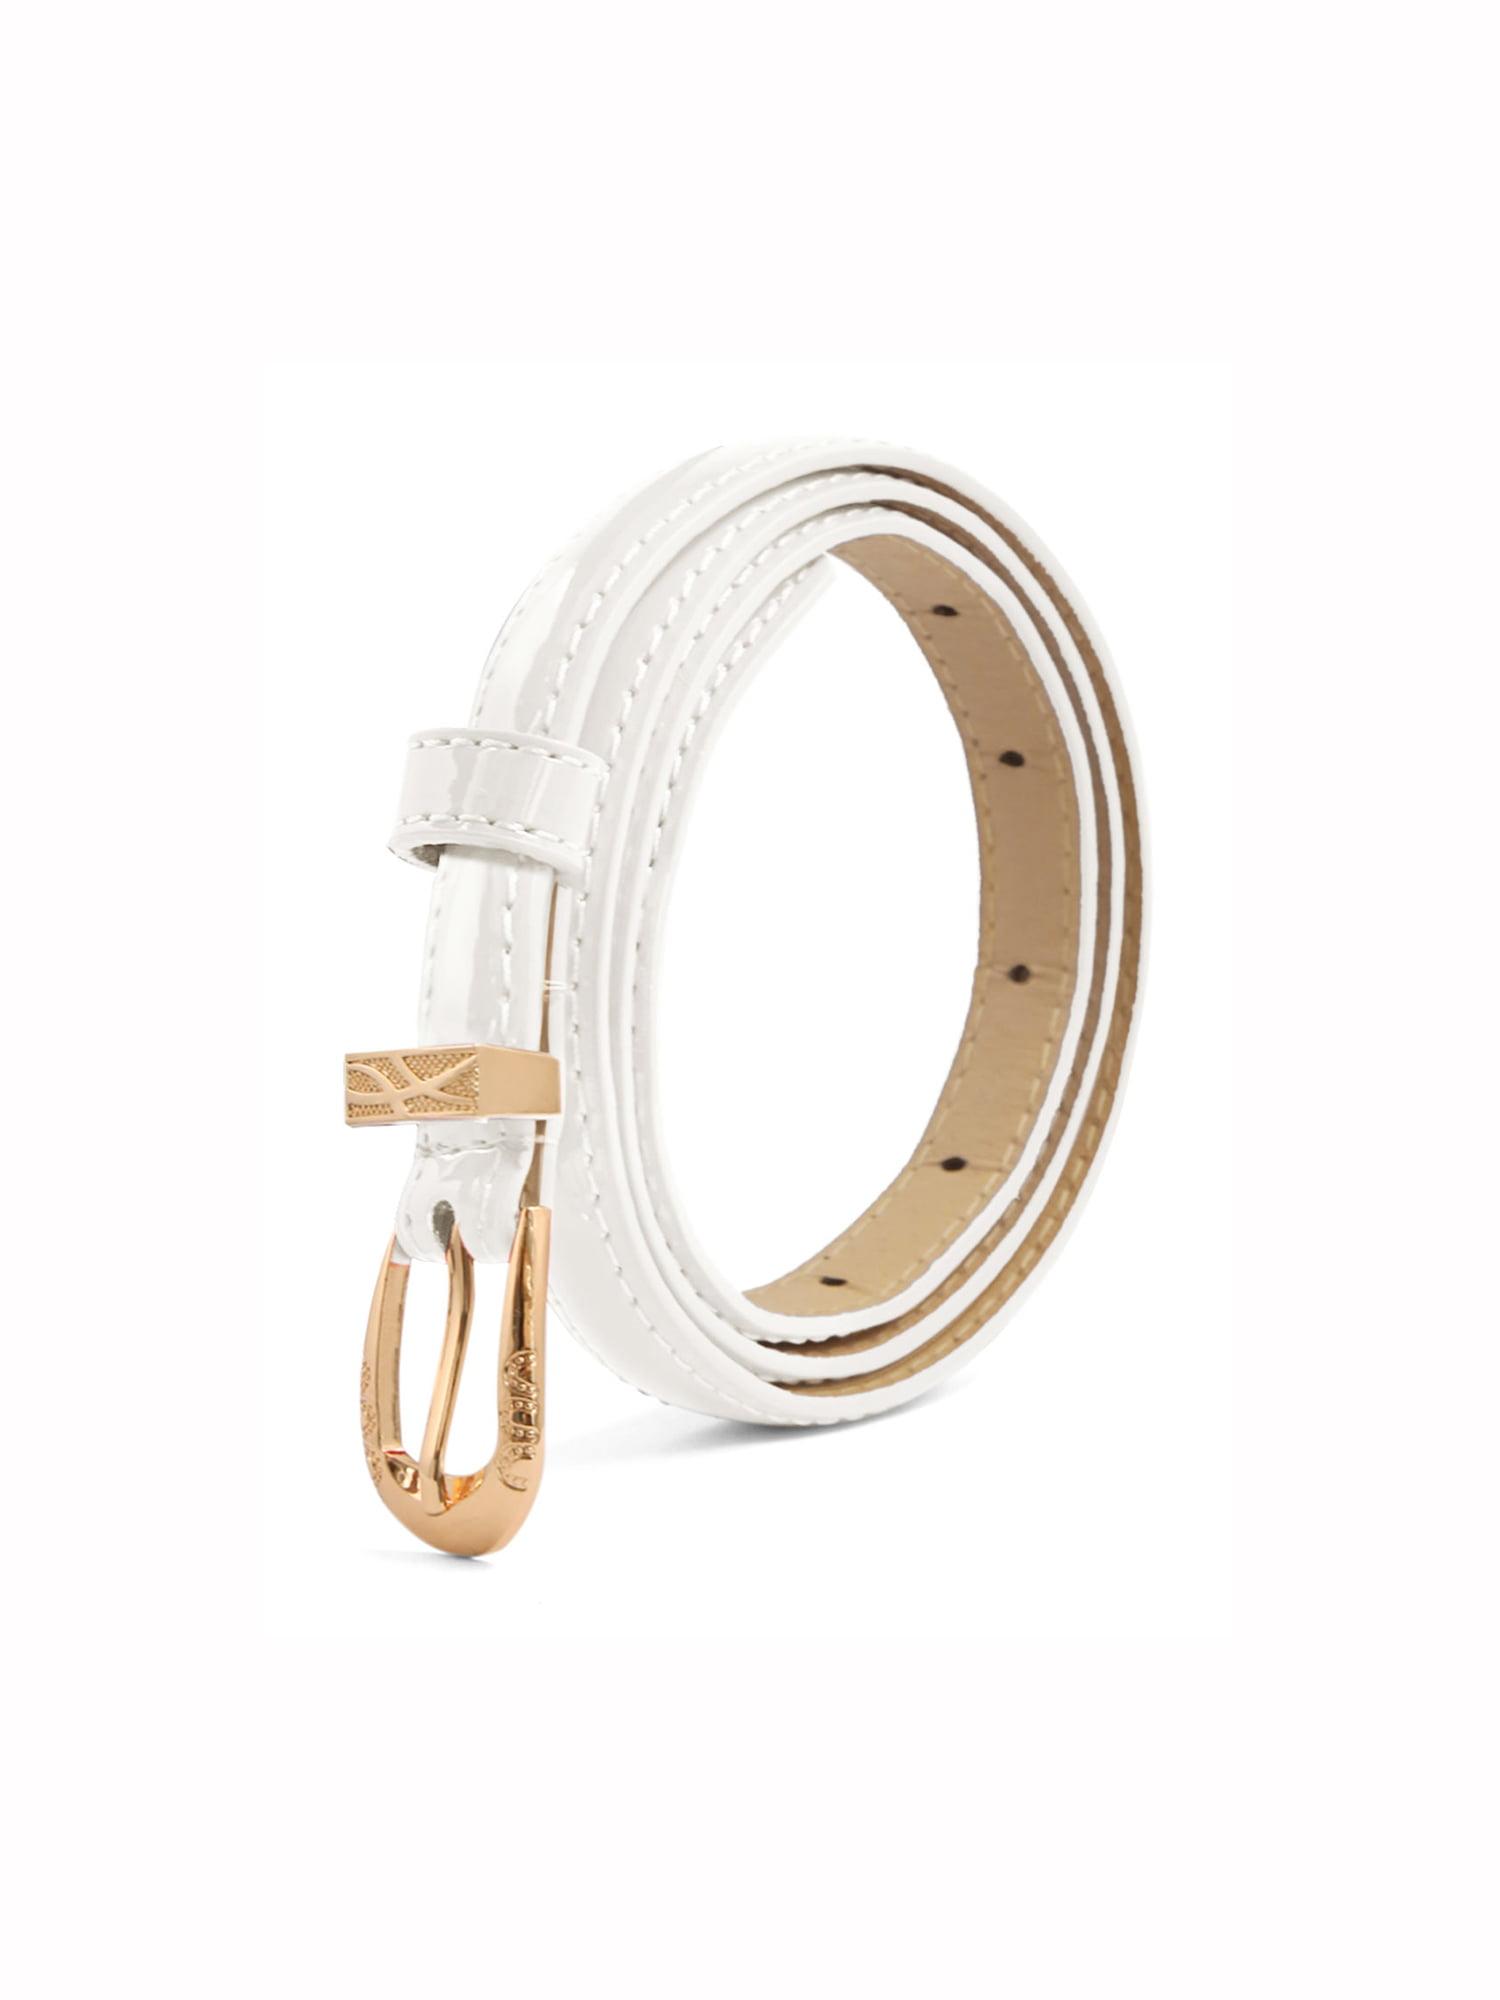 Allegra K Women Bowknot Design Metal Press Stud Buckle Faux Leather Waist Belt Apricot